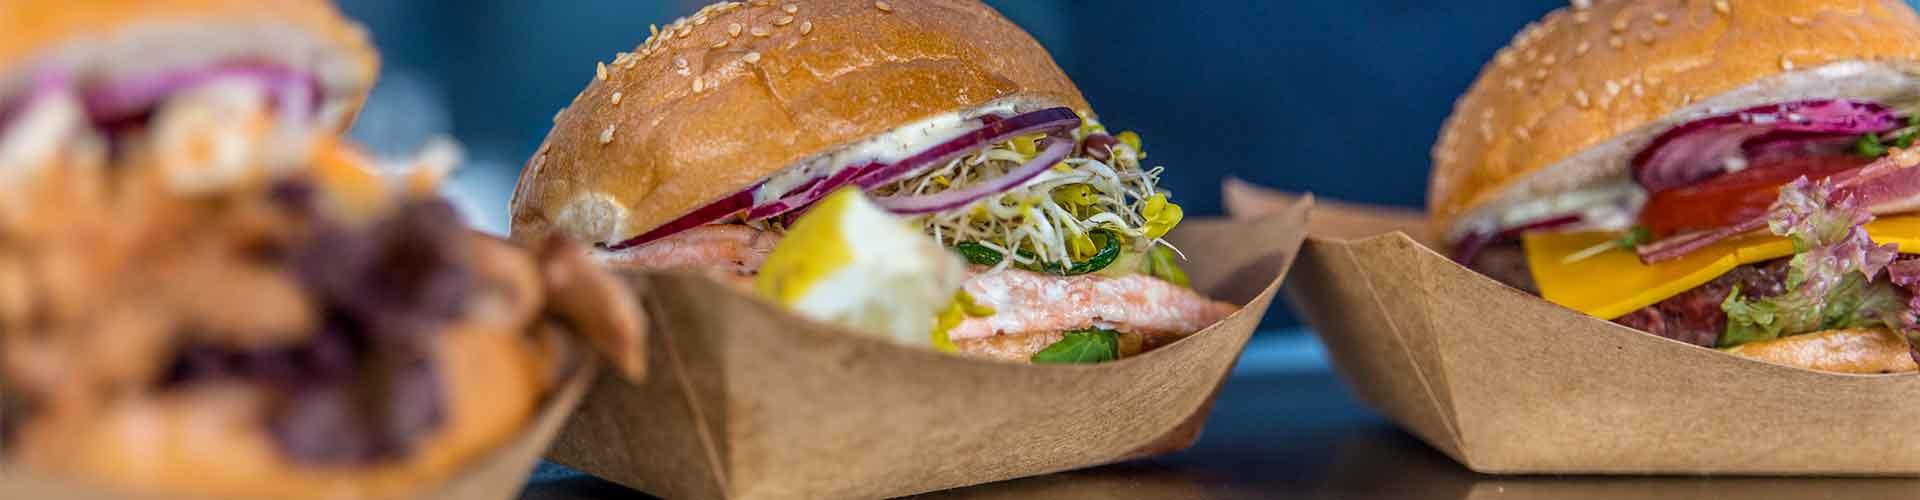 Burger Variationen Foodtruck Street Food